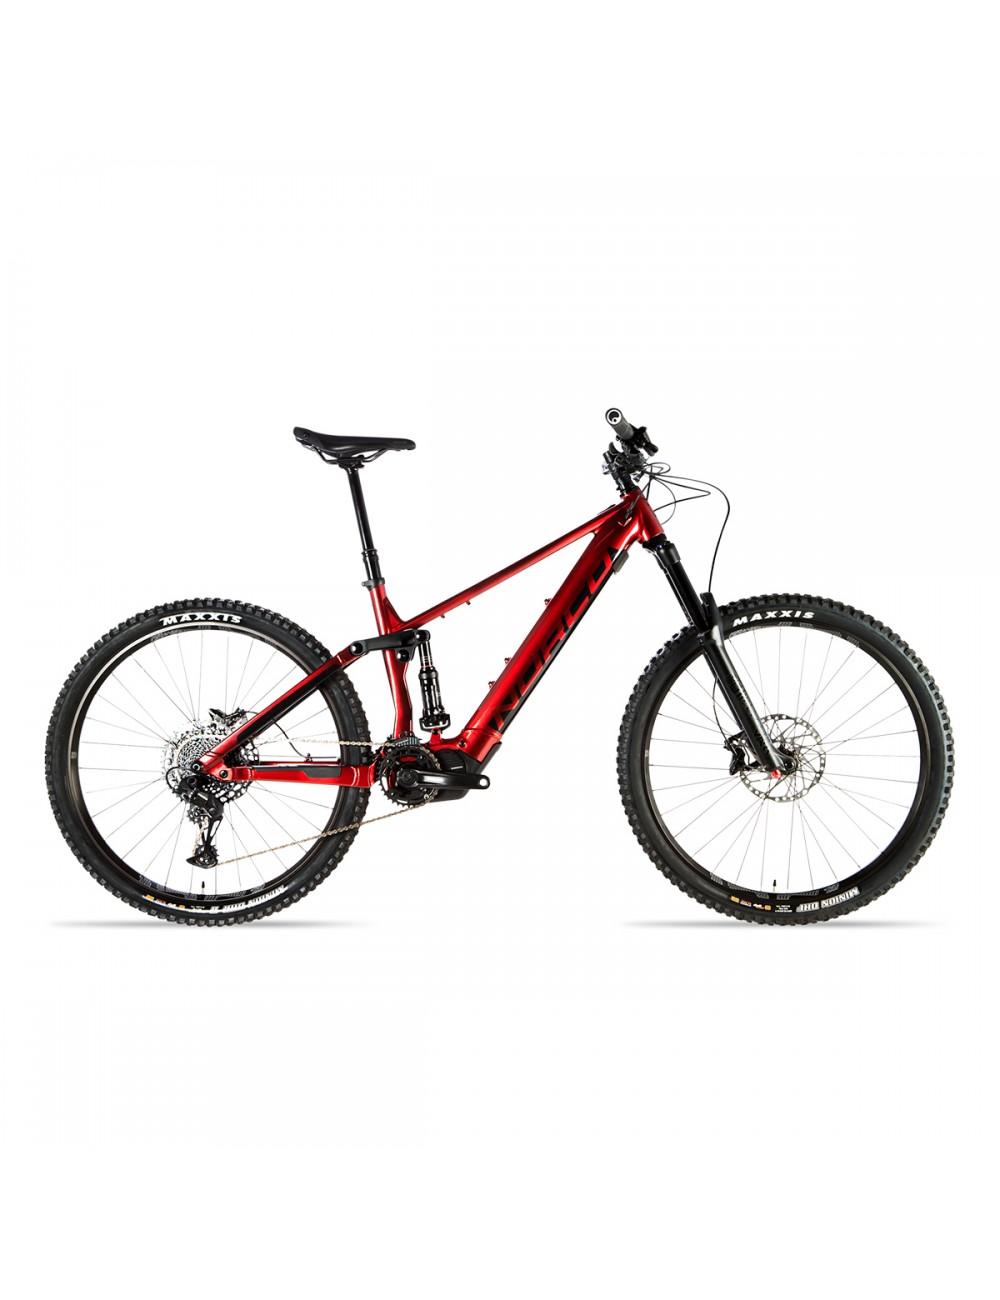 Norco Sight VLT A9.1 Bike - Blood Red/Black_12902